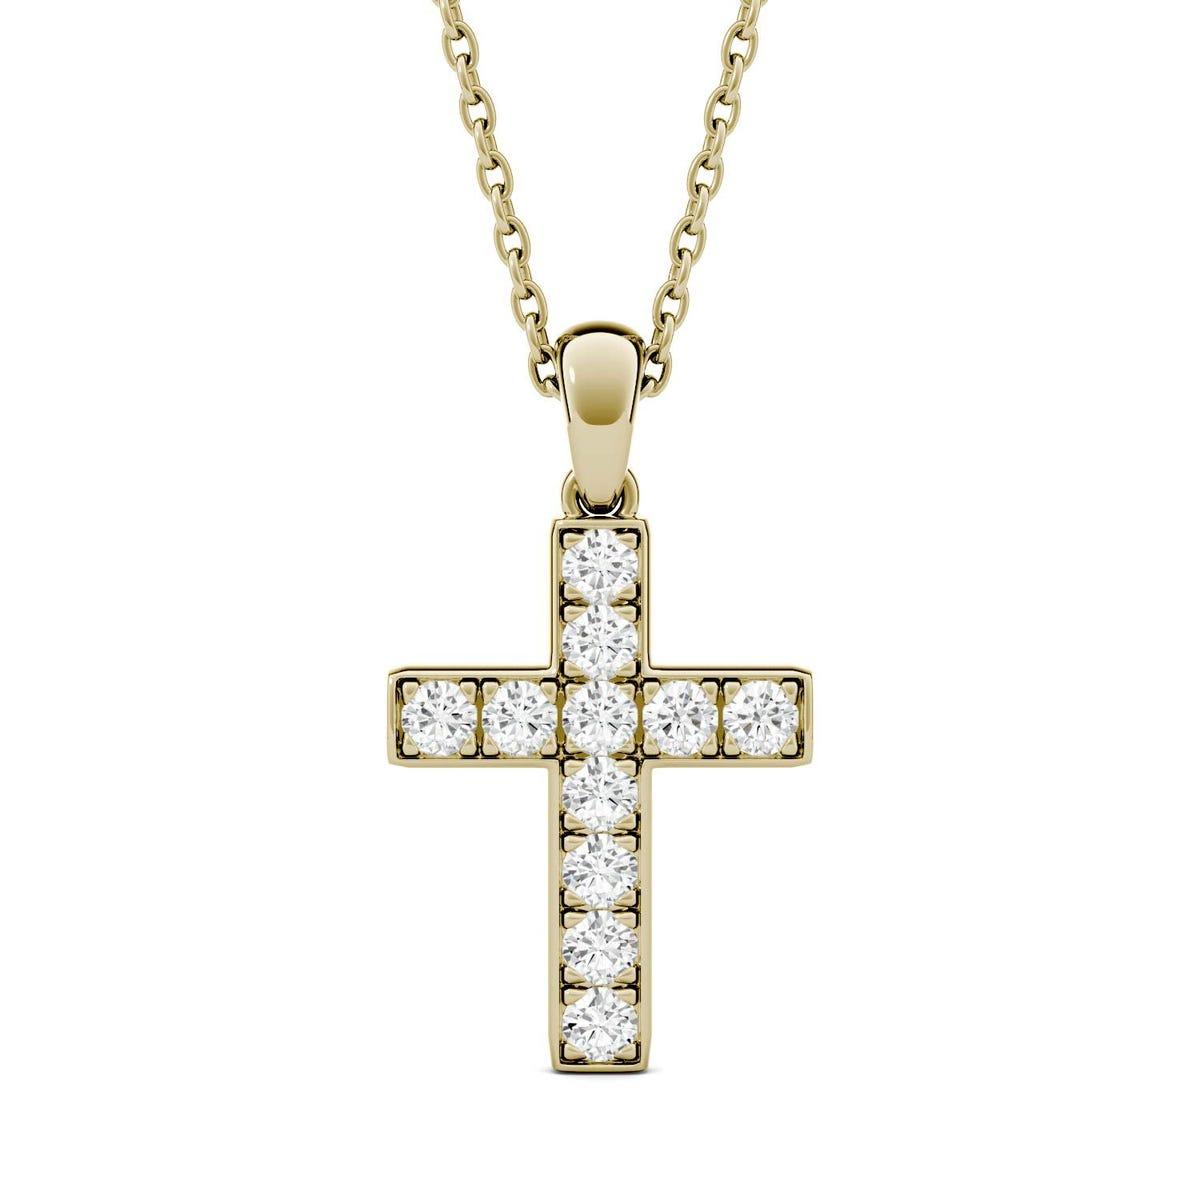 1b0f5ffb6 Cross Jewelry A Fashion Statement Or Catholic Symbol